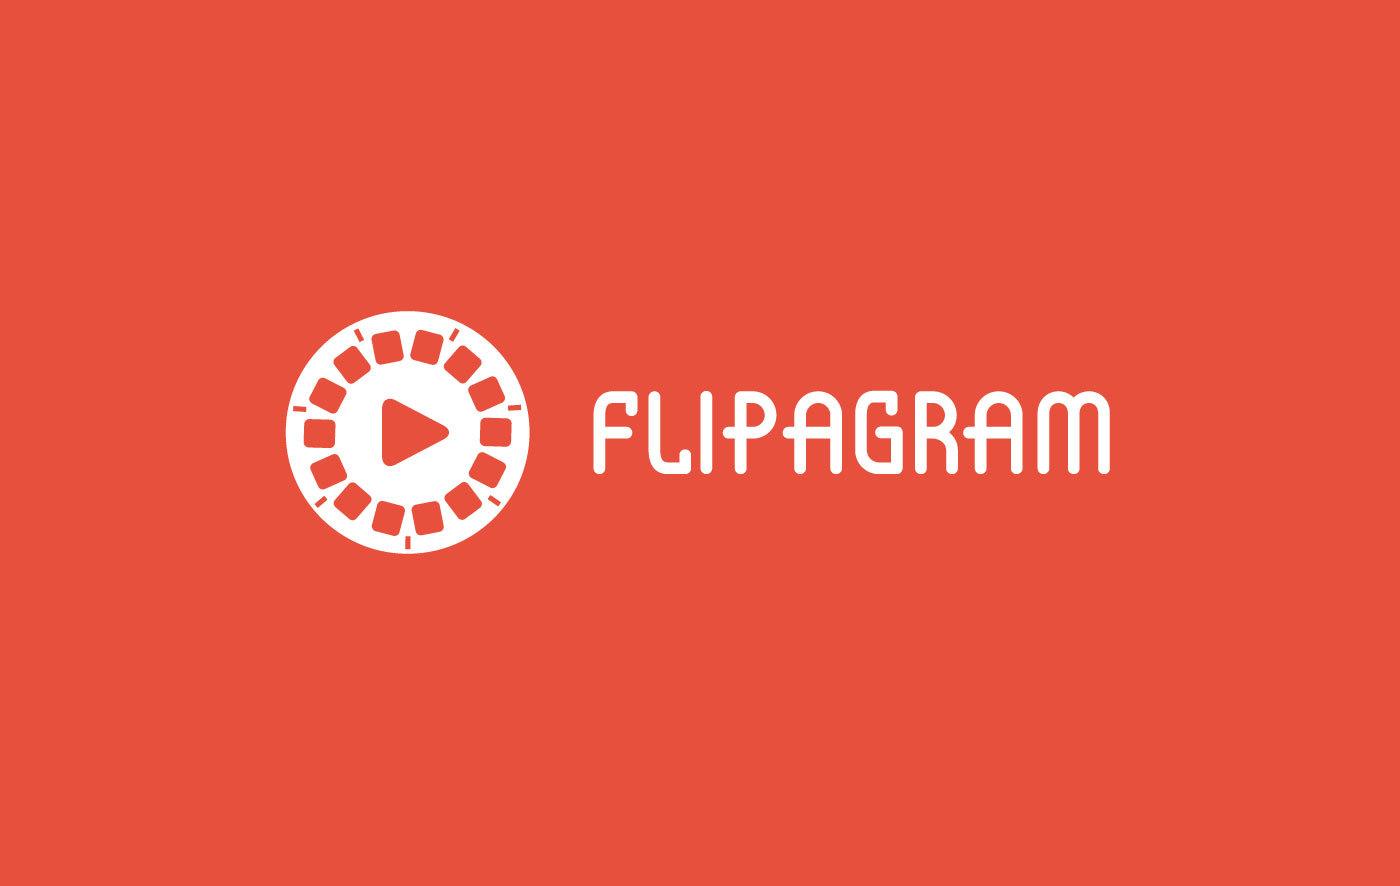 Flipagram Brand Identity / Logo by Sabet Brands